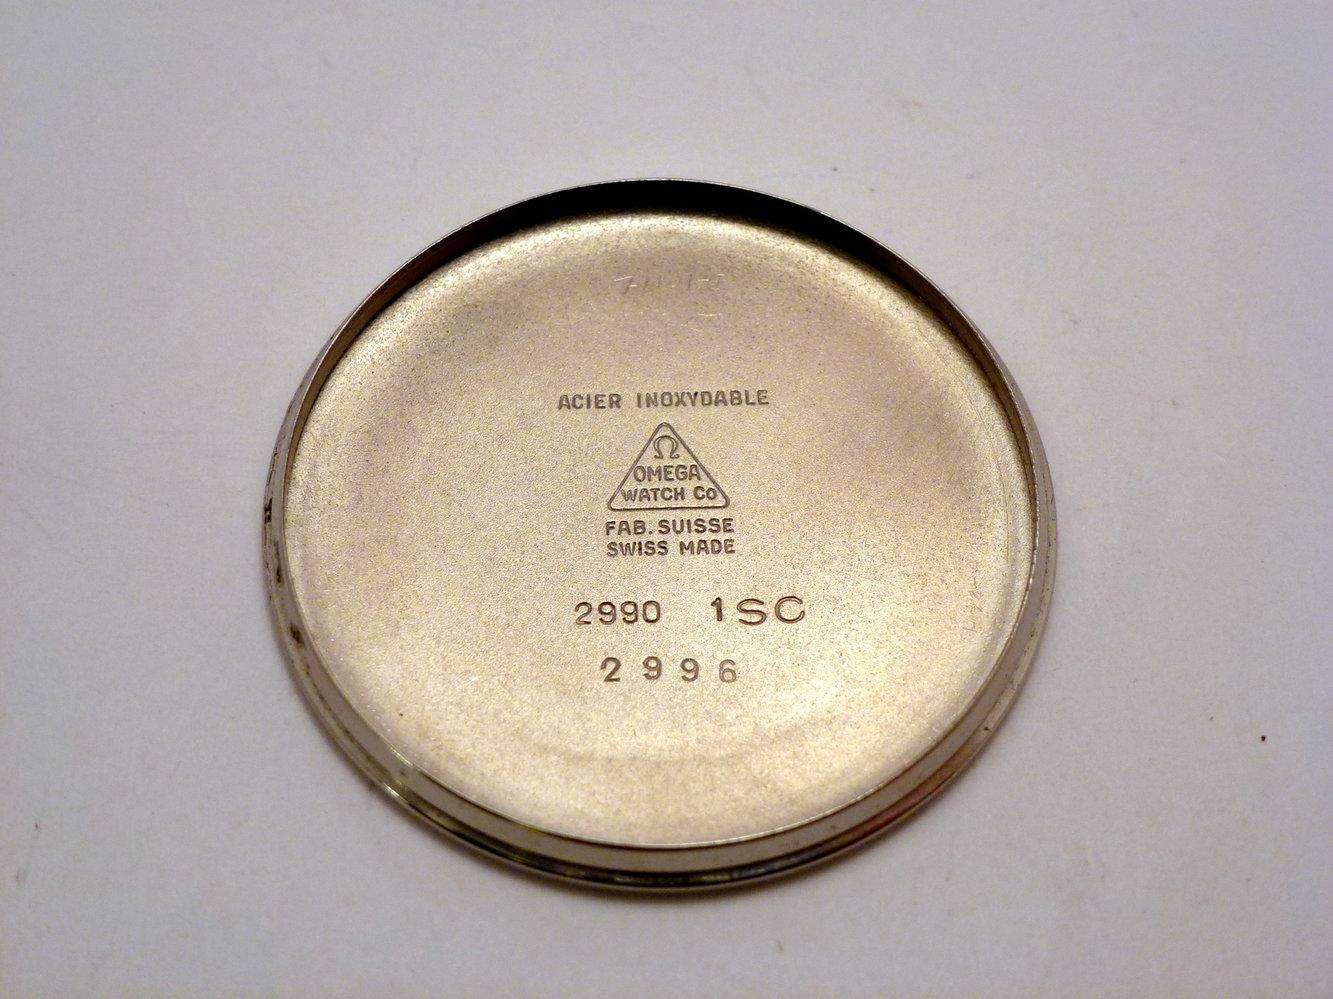 P1050041.JPG